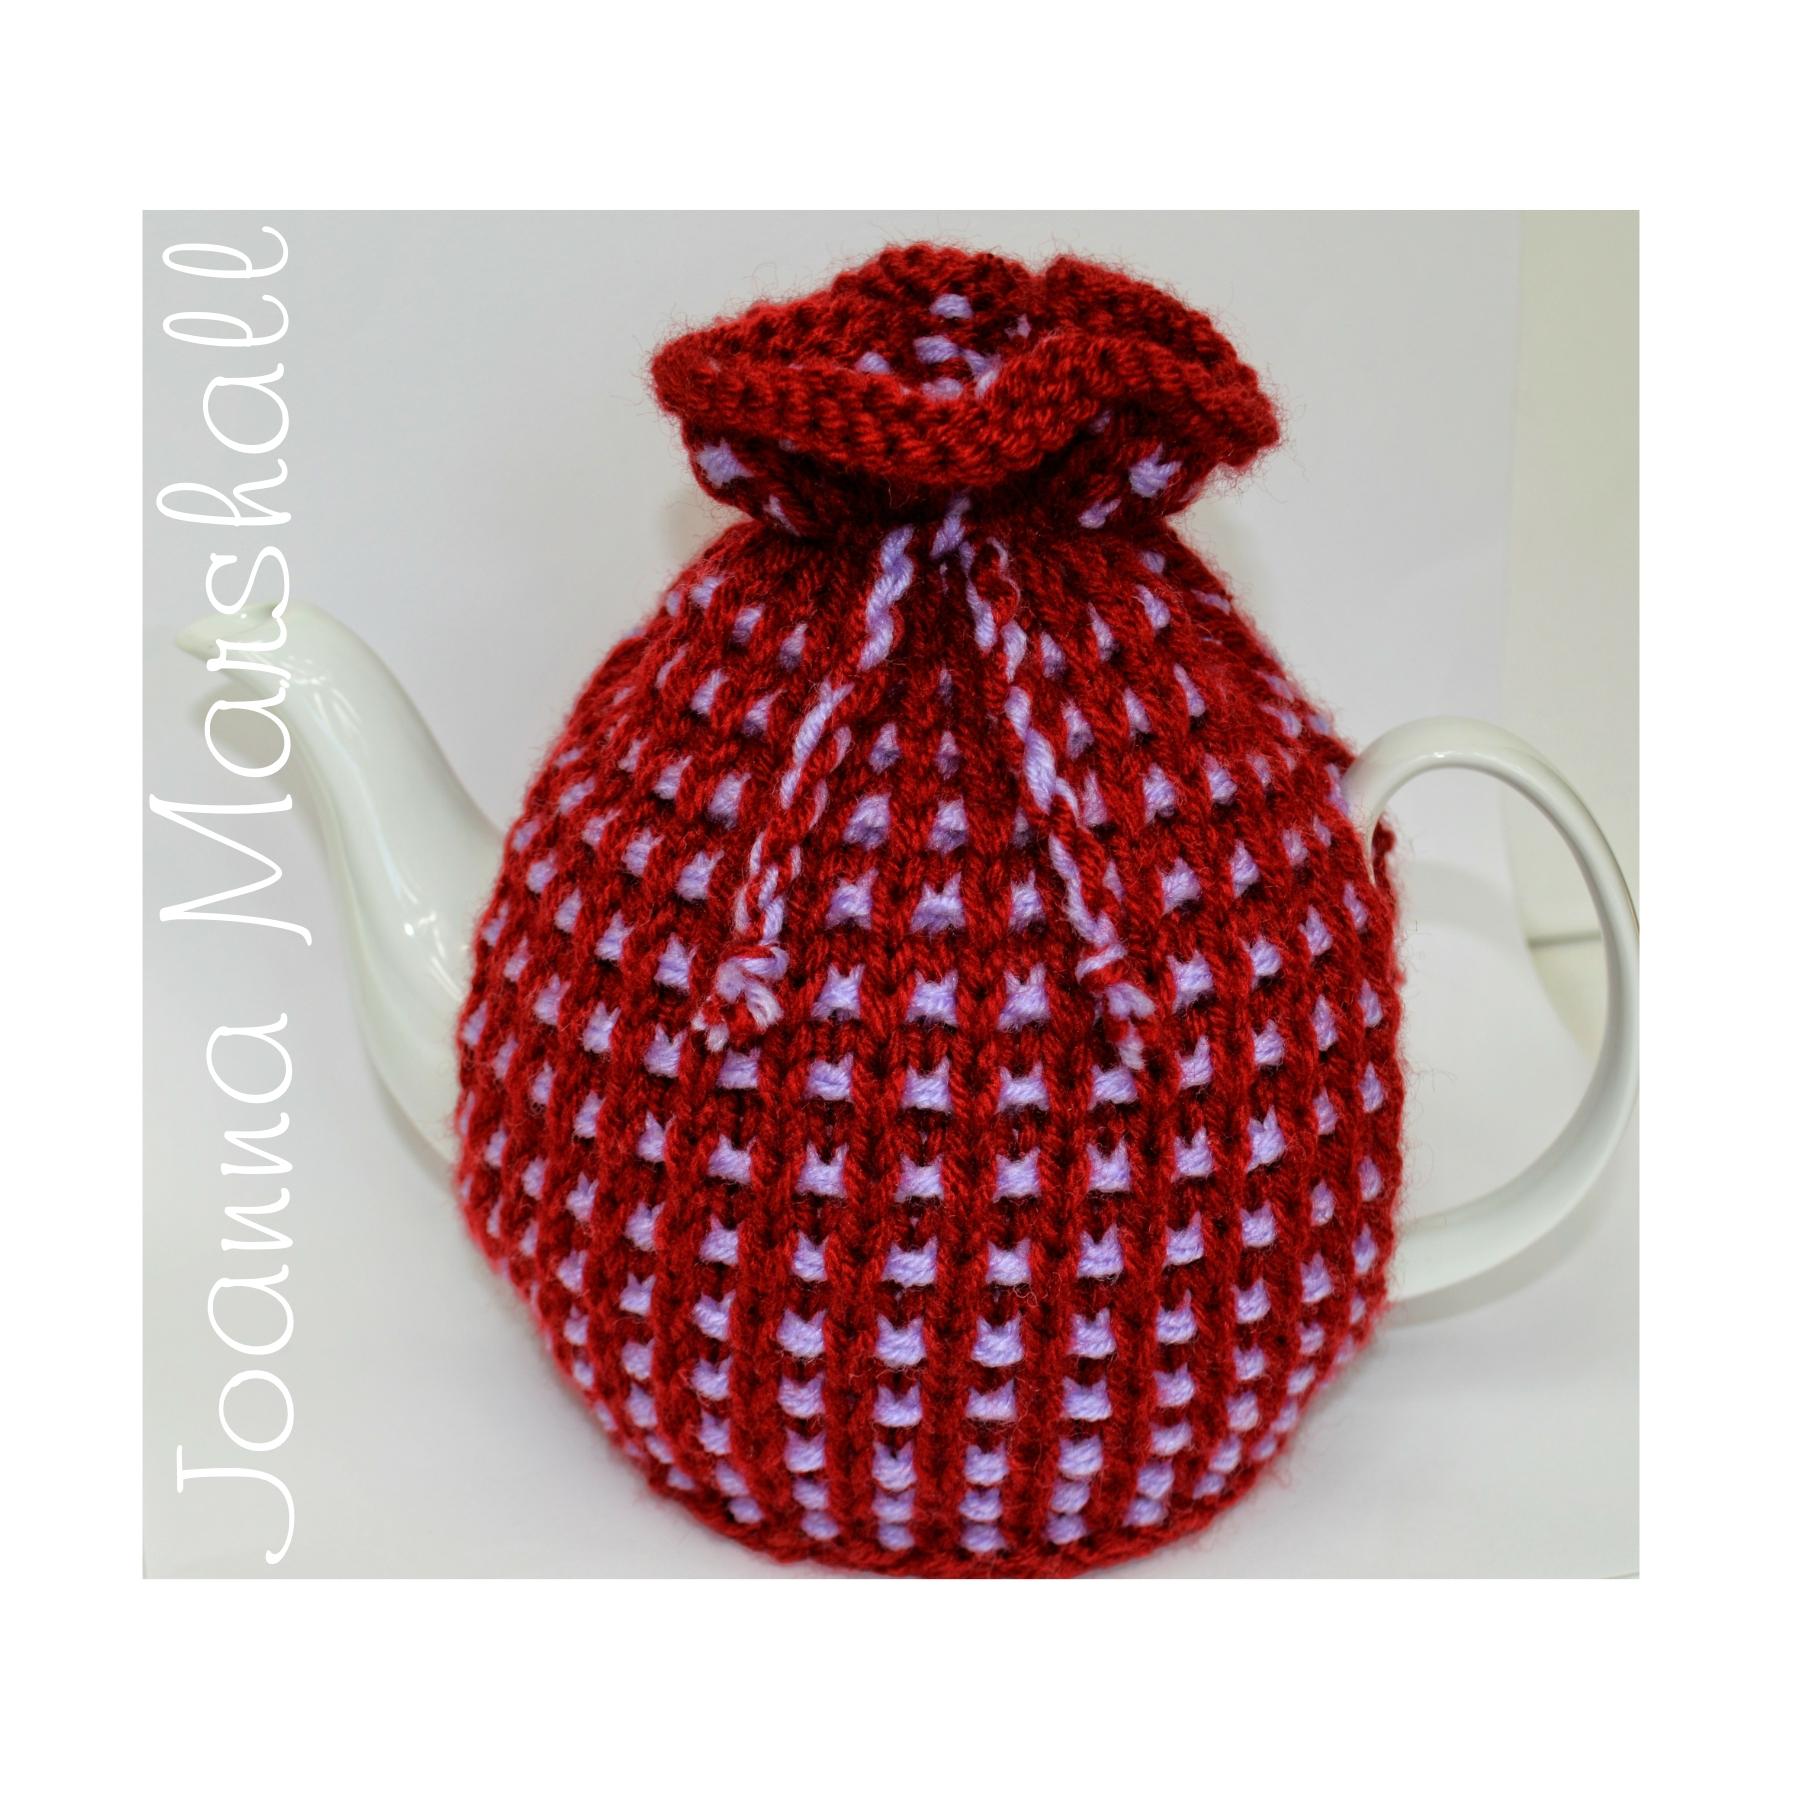 Basket Ribbed Tea Cozy Knitting Pattern